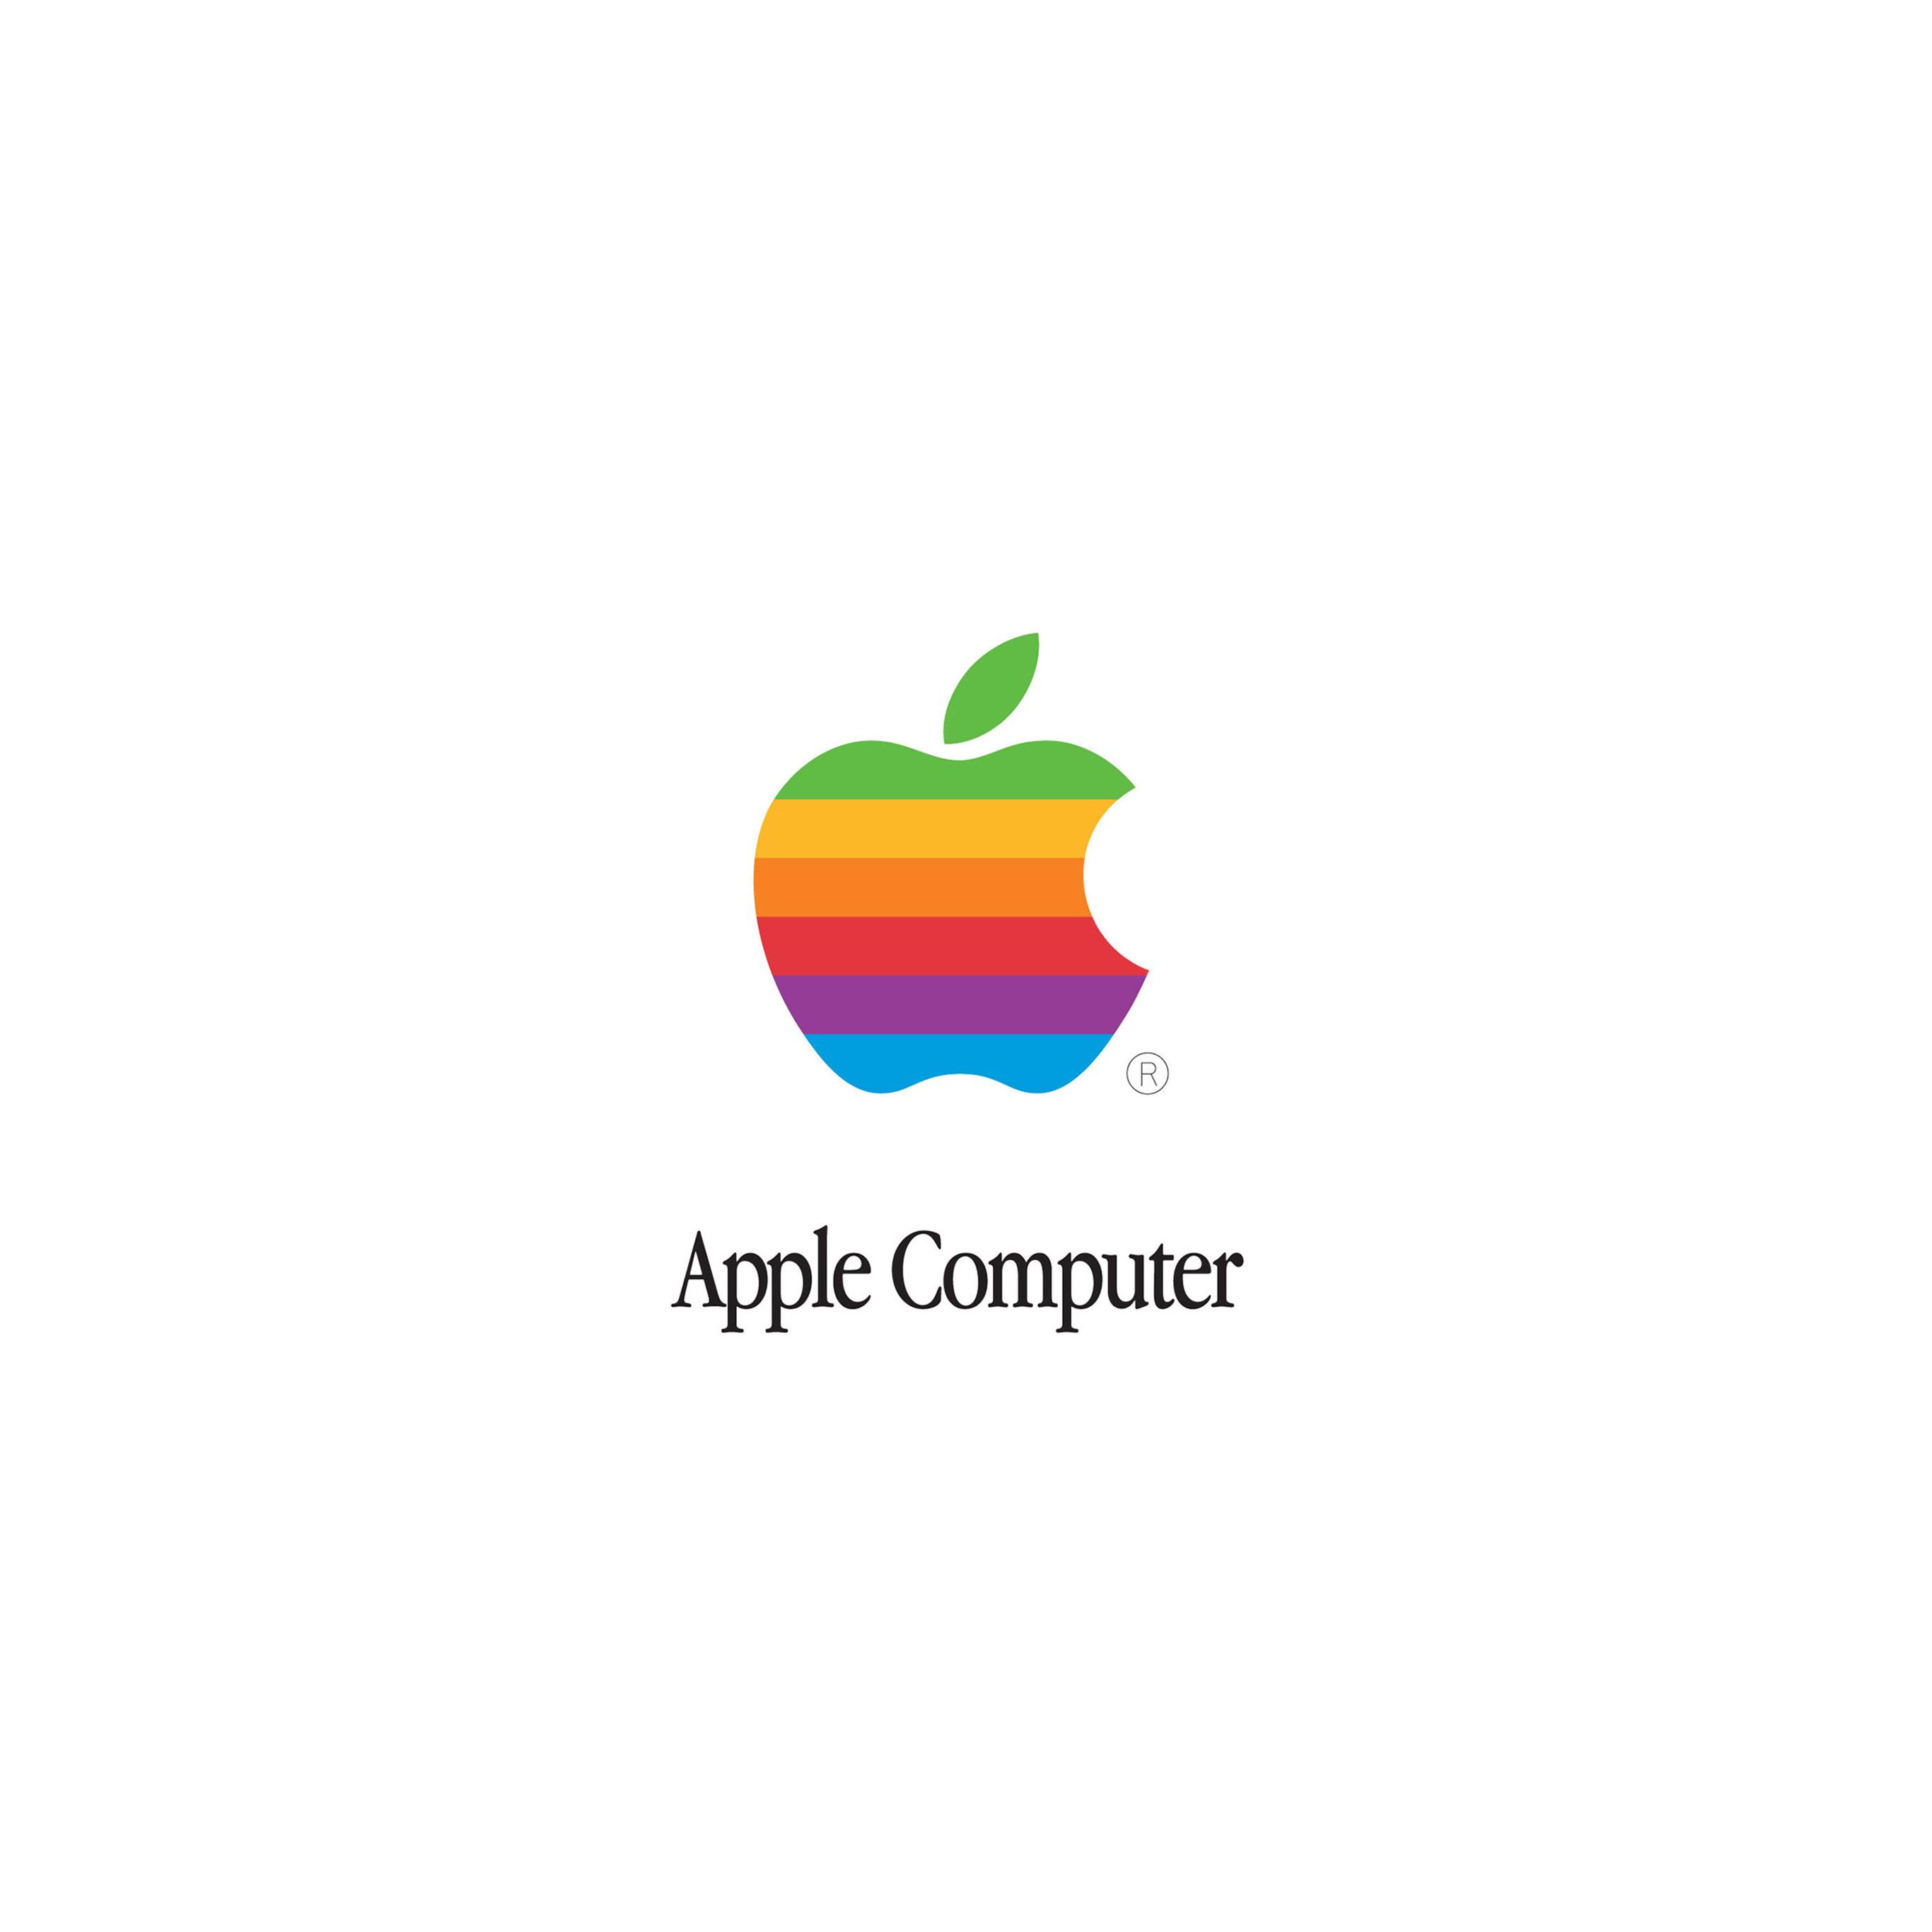 0011 freeios7com apple wallpaper apple computer ipad retina parallax 2732x2732